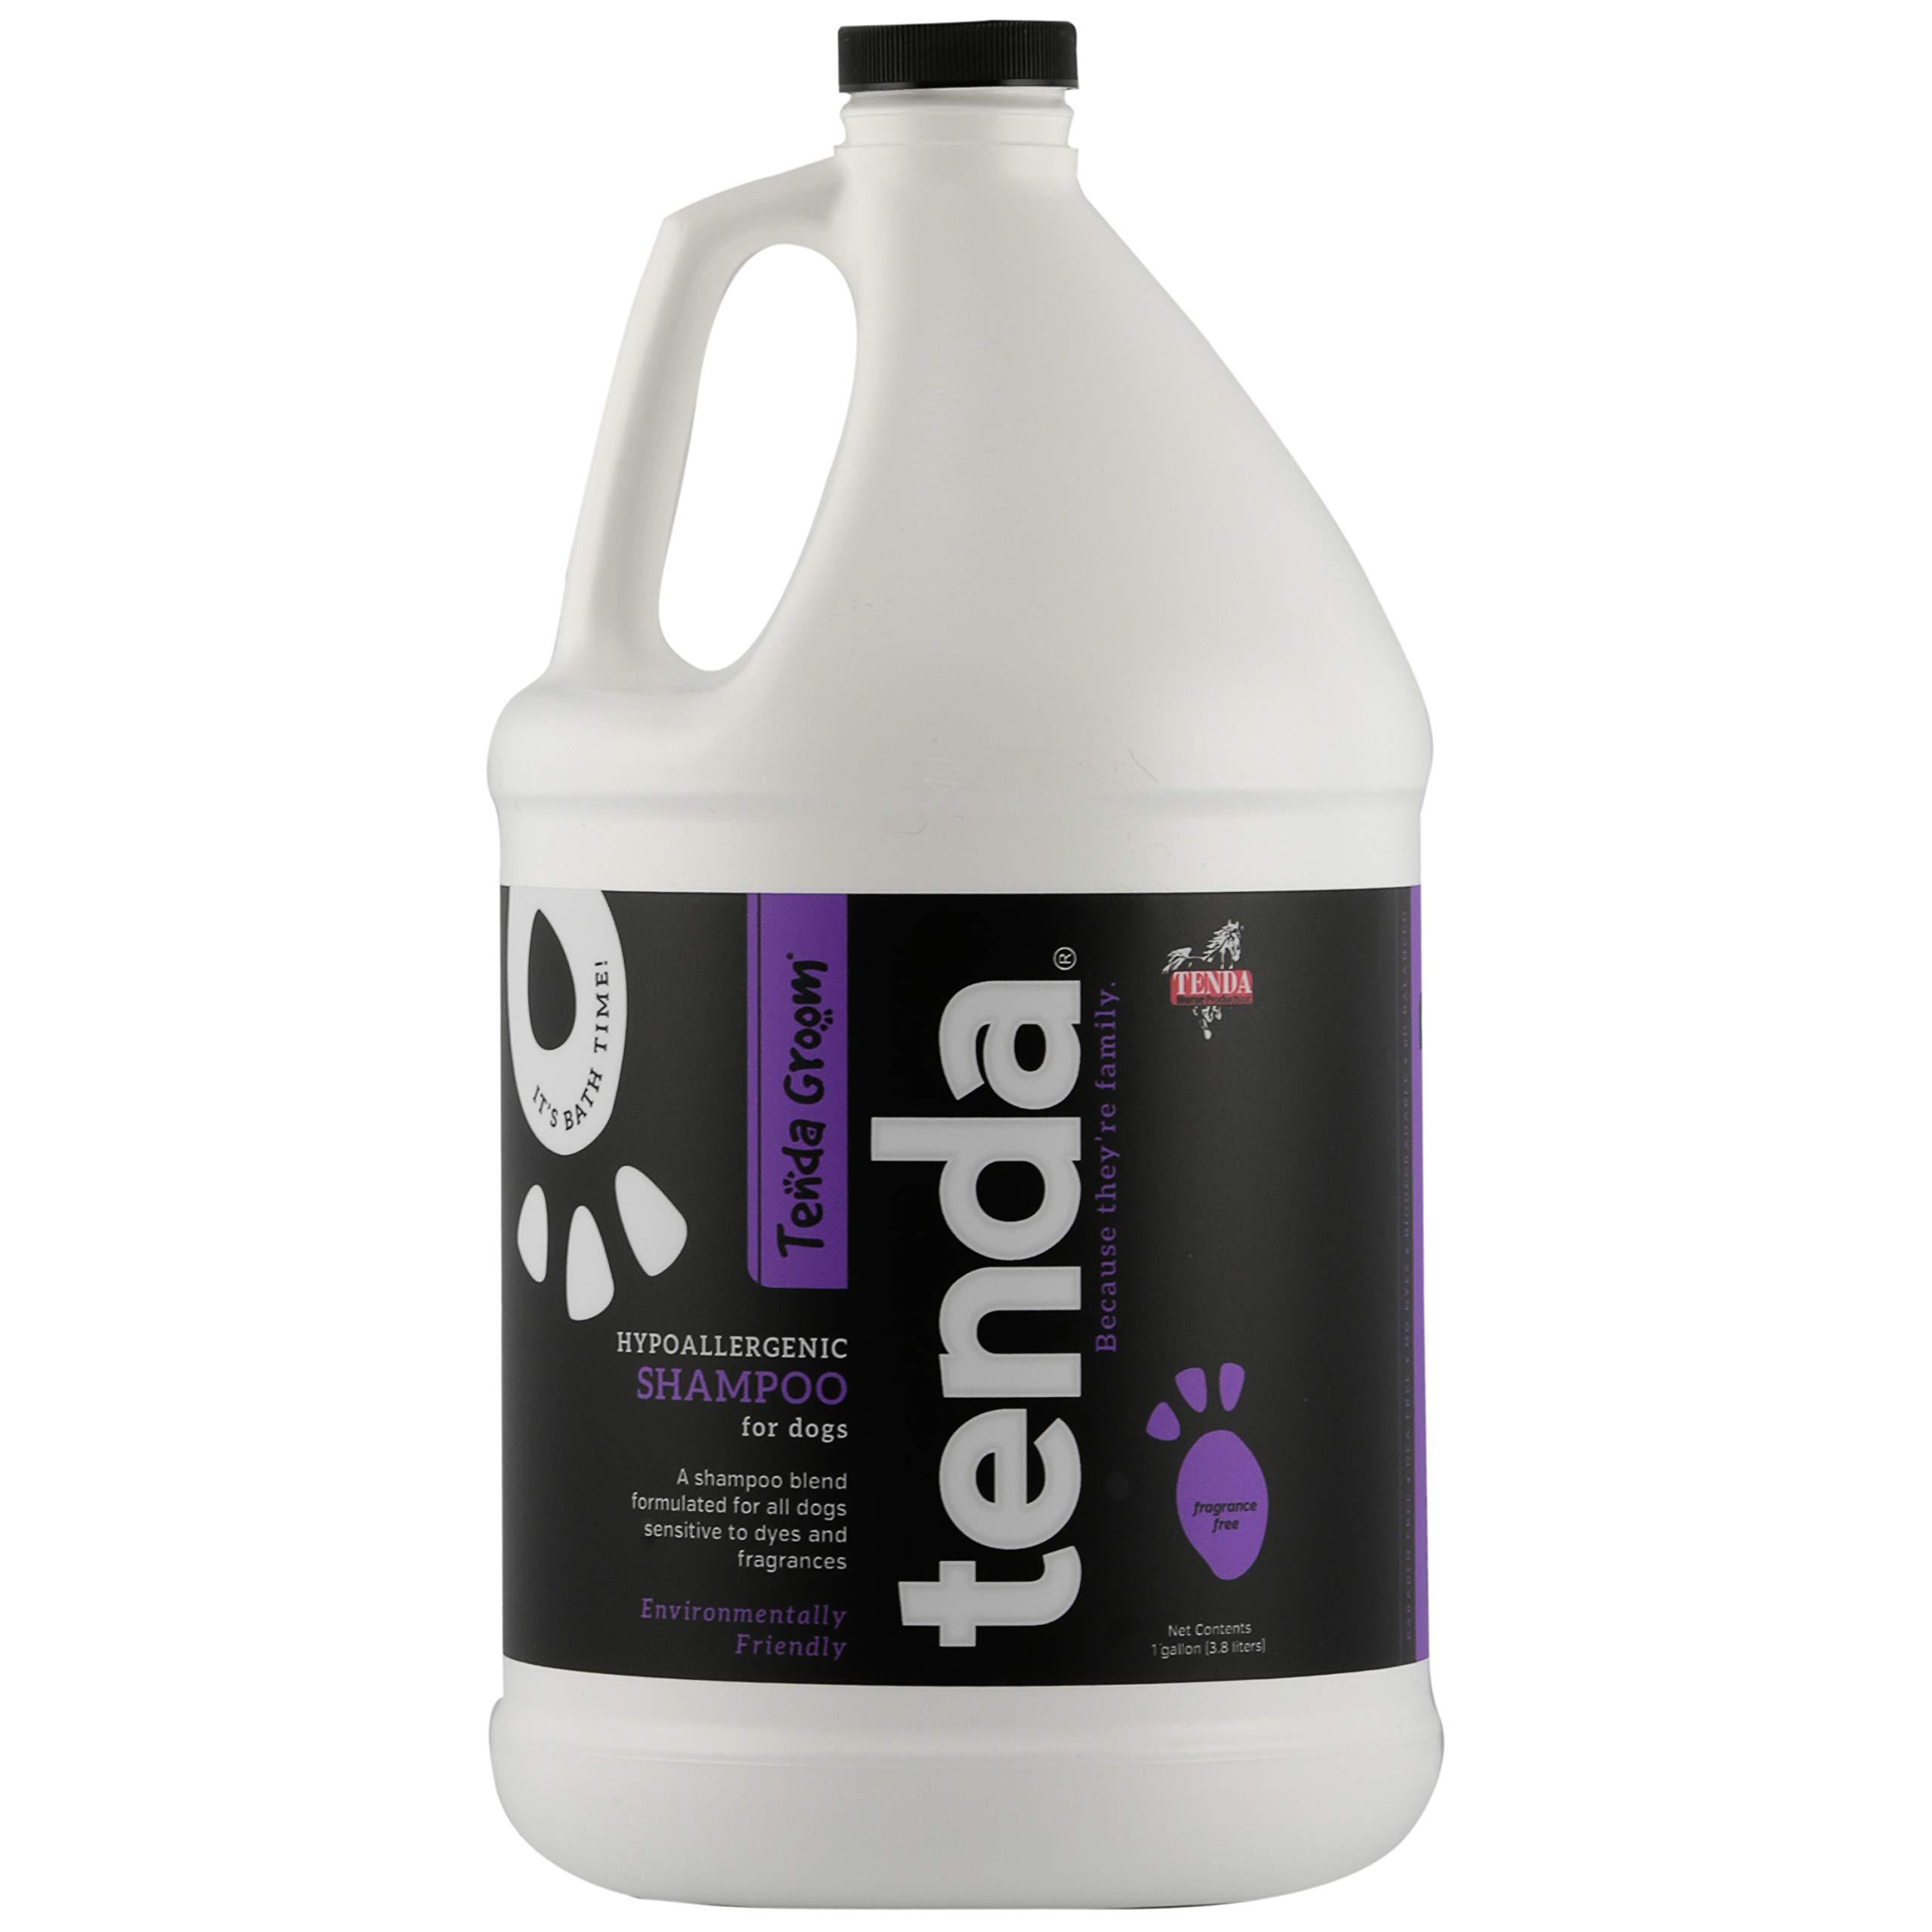 Tenda Groom Hypoallergenic Dog Shampoo, Gallon